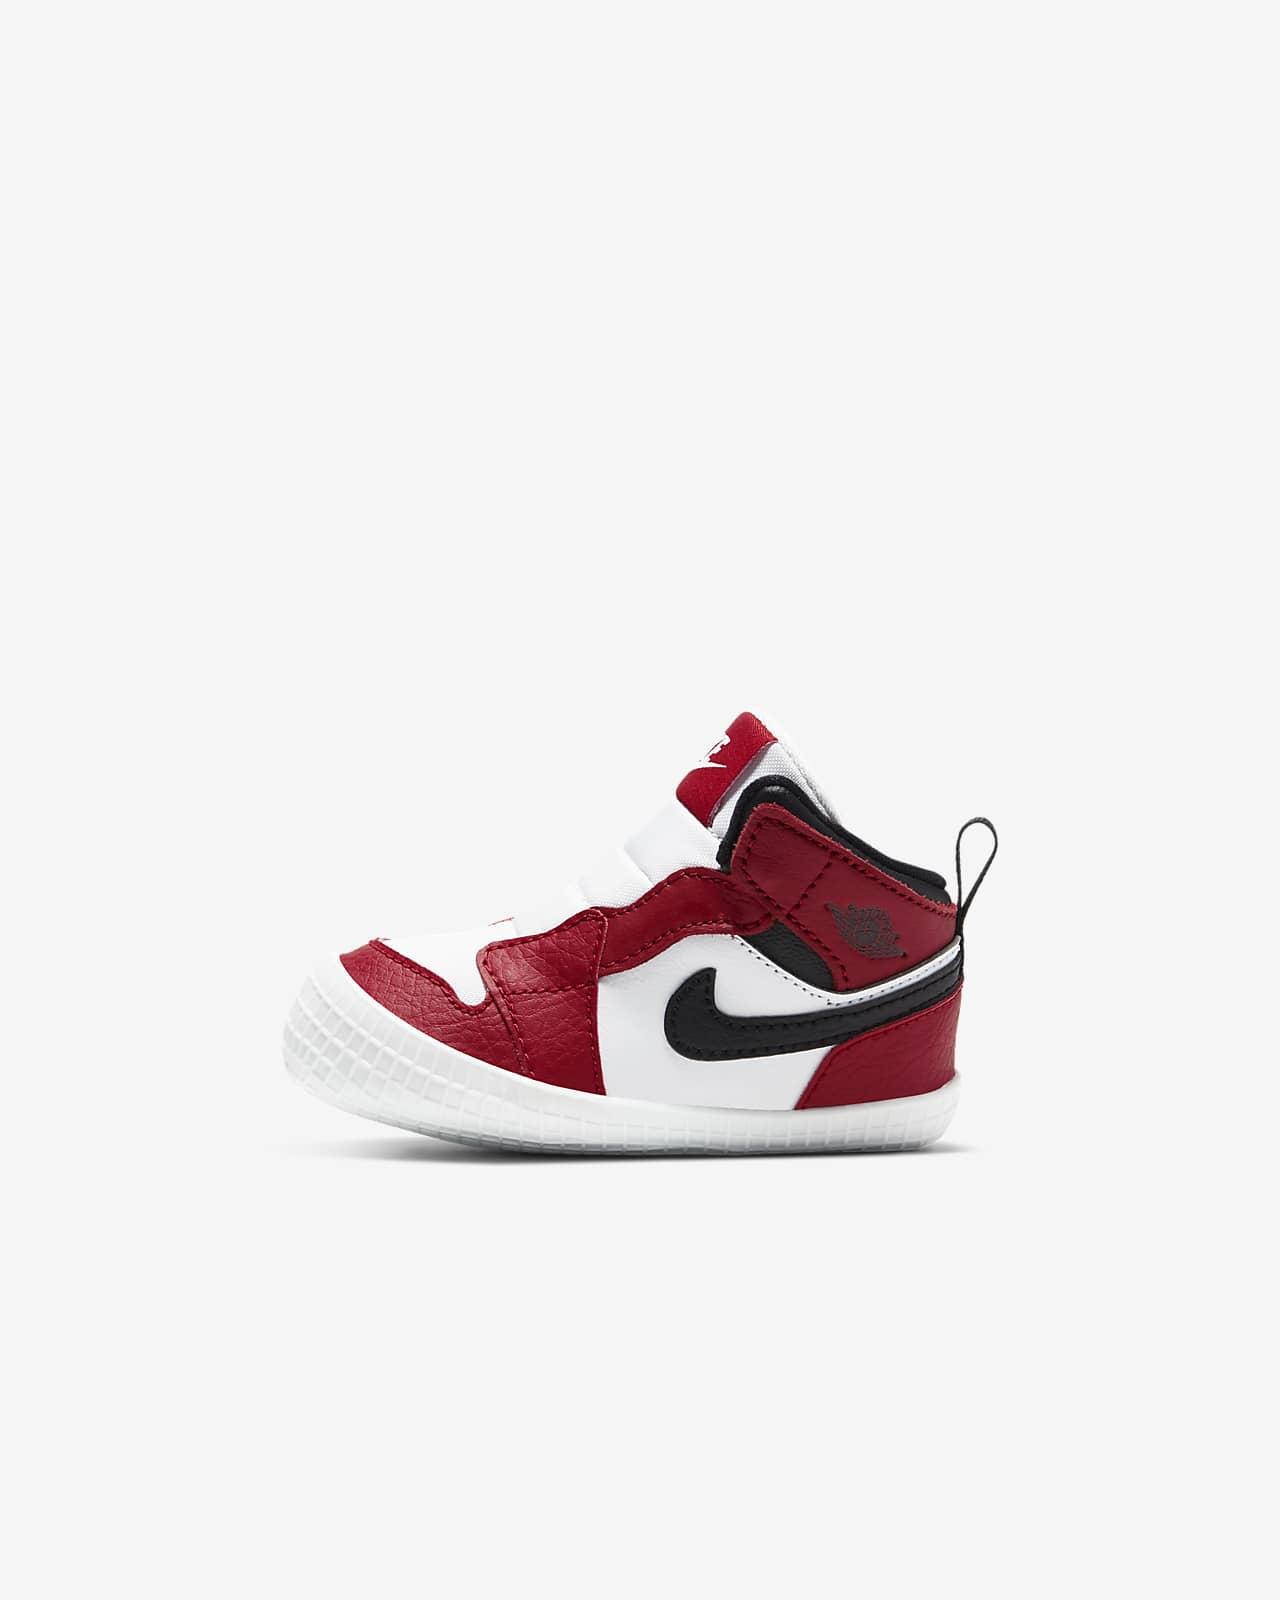 Jordan 1 Baby Cot Bootie. Nike SG